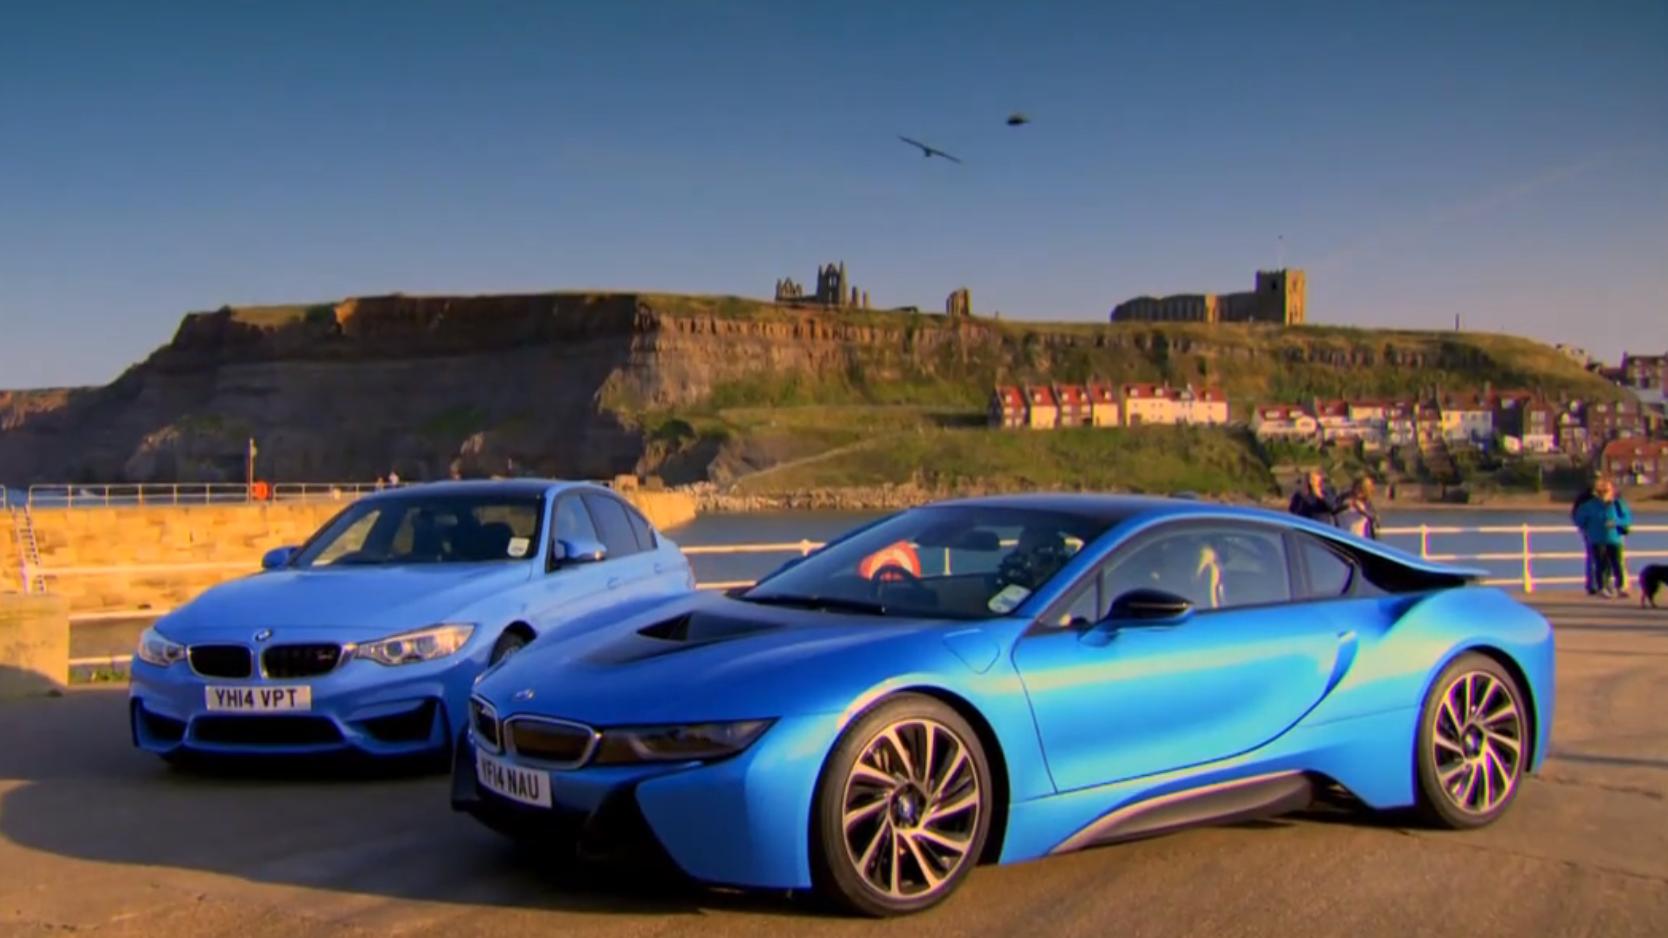 Top Gear's Jeremy Clarkson Pits the BMW M3 vs the i8 - BimmerFile on top gear toyota tundra, top gear jaguar e-type, top gear maserati quattroporte, top gear alfa romeo 4c, top gear mclaren p1, top gear toyota tacoma, 1970 bmw m3, top gear jaguar f-type, car bmw m3, 1990 bmw m3, top gear lexus lfa, top gear bugatti veyron, adam carolla bmw m3, wheeler dealers bmw m3, top gear aston martin vanquish, hamann bmw m3, top gear ford gt, top gear lamborghini gallardo, top gear range rover, michelle rodriguez bmw m3,